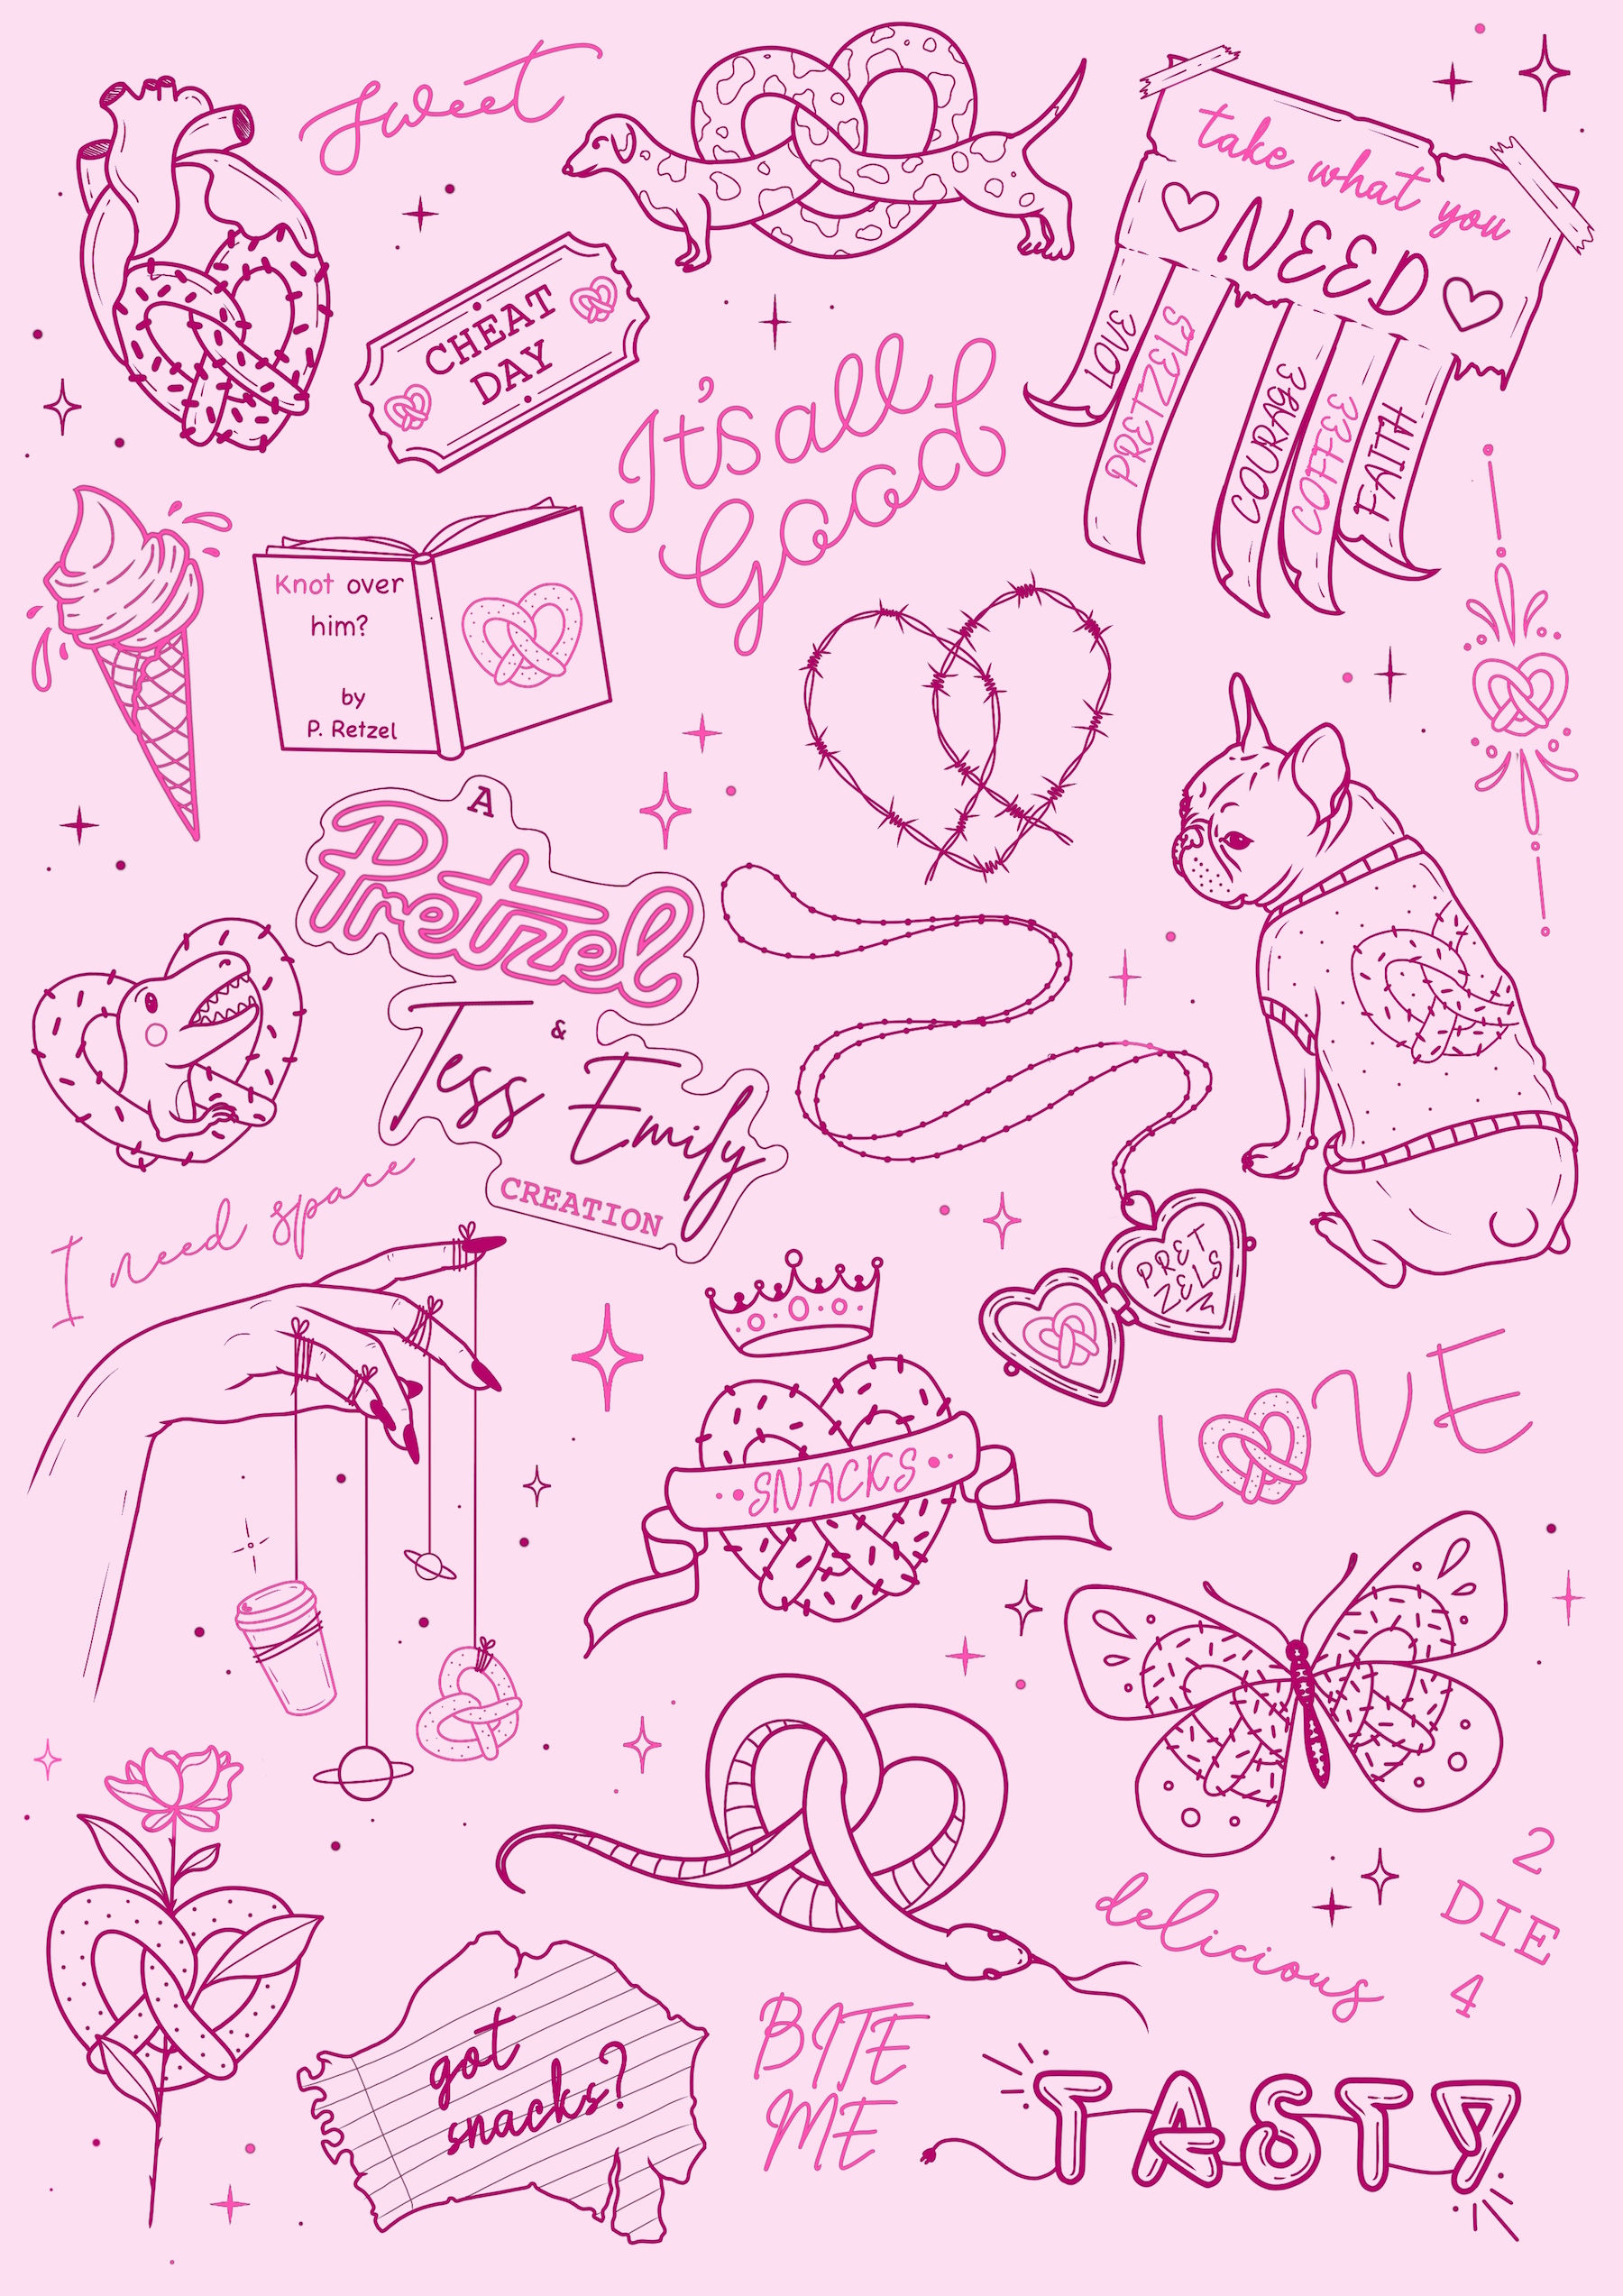 Pretzel Tess Emily Tattoo Choices